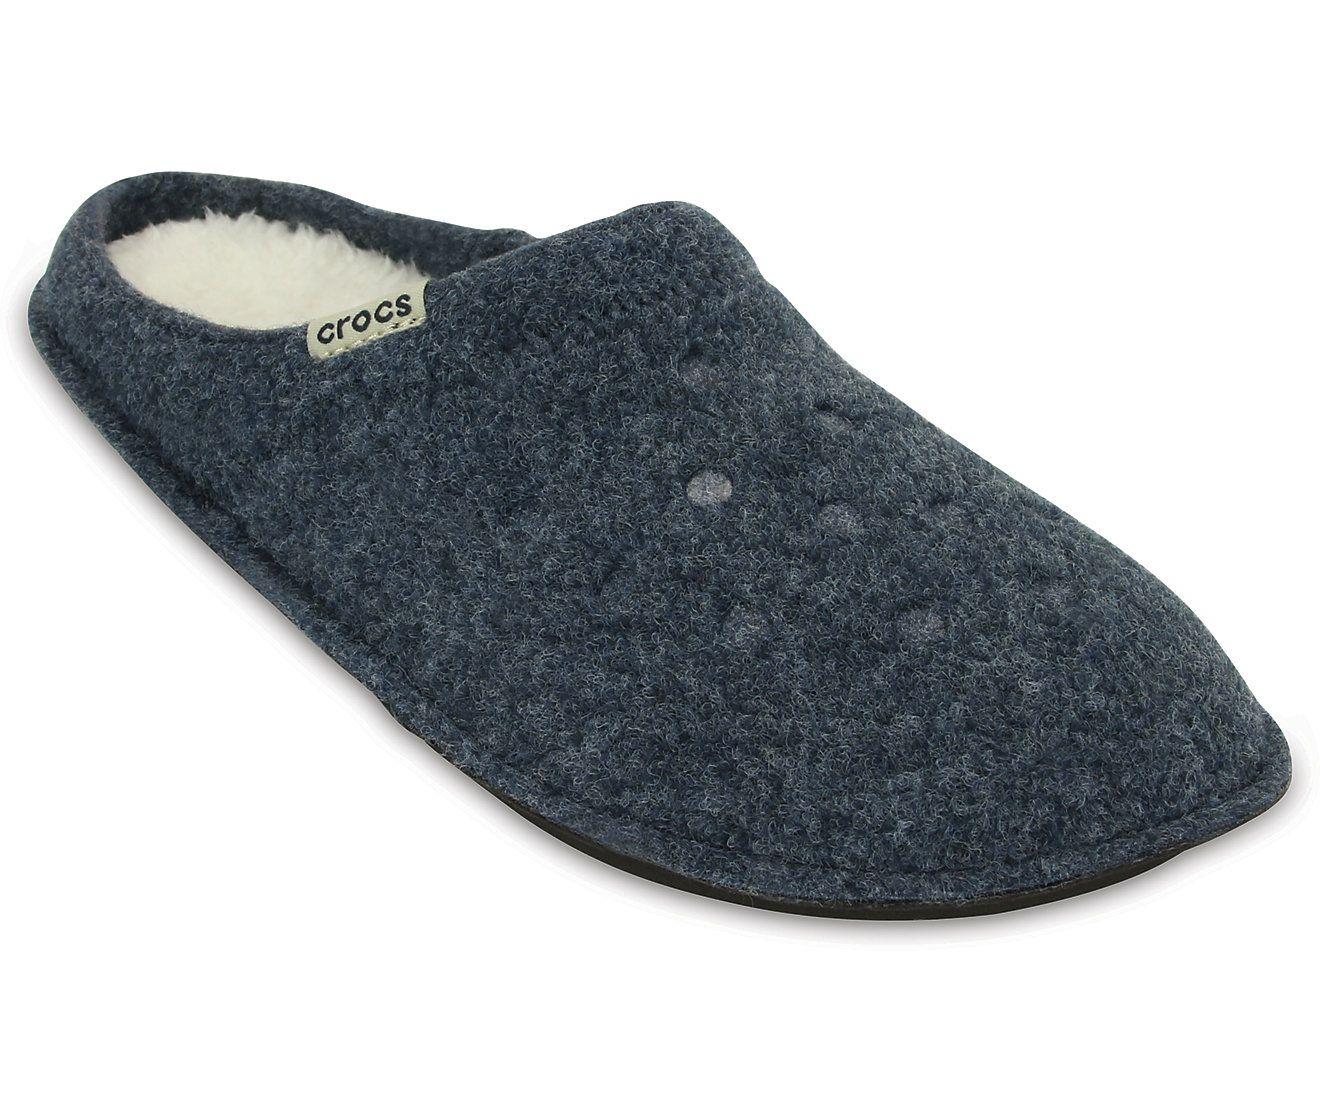 Crocs Classic Navy Boys Slipper